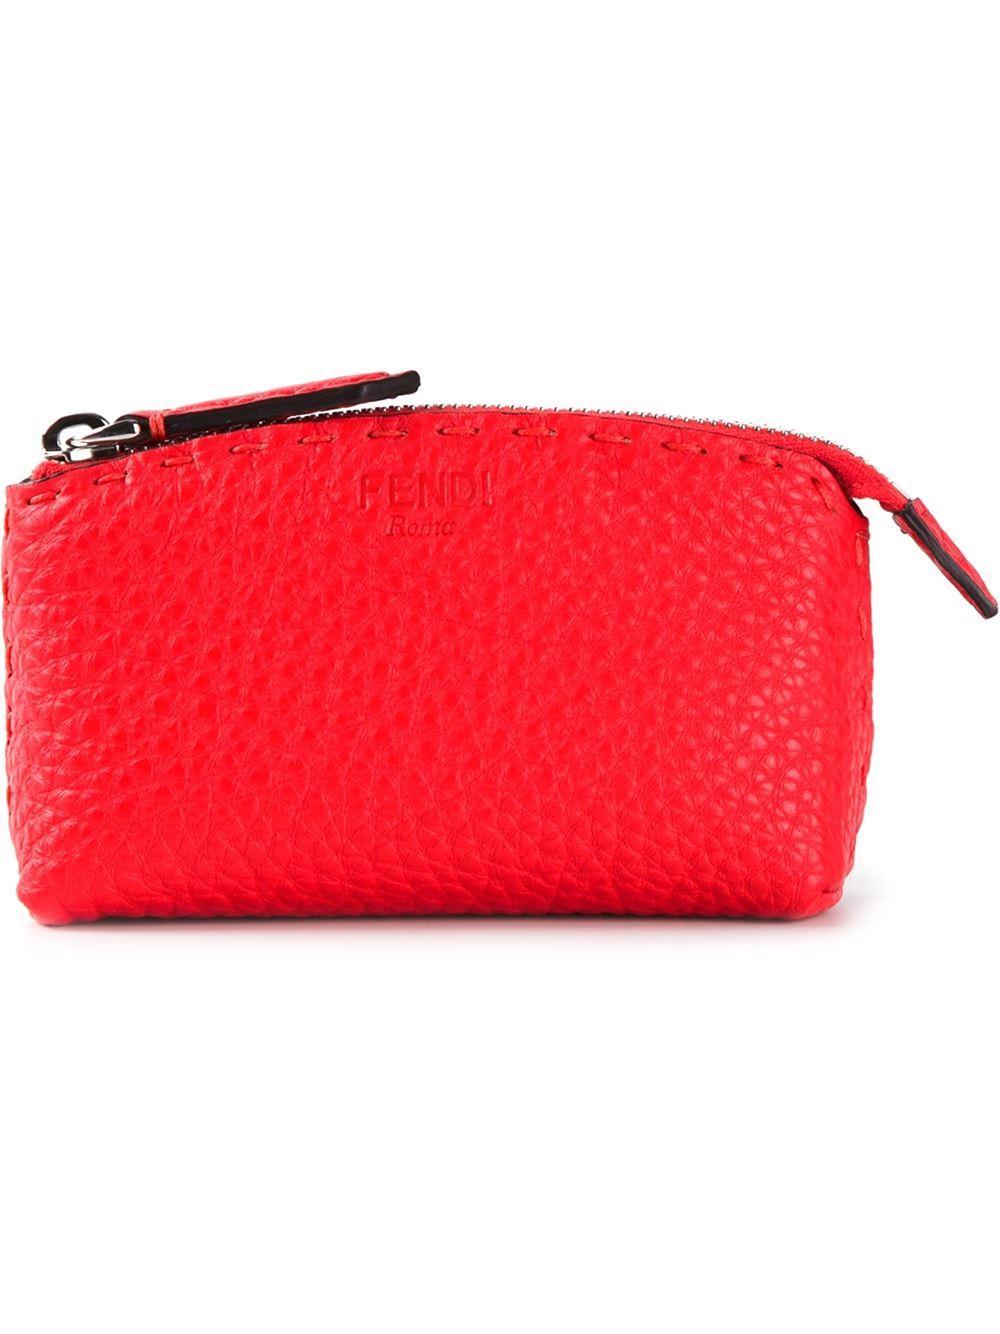 f66eeea5b8 Lyst - Fendi Selleria Makeup Bag in Red